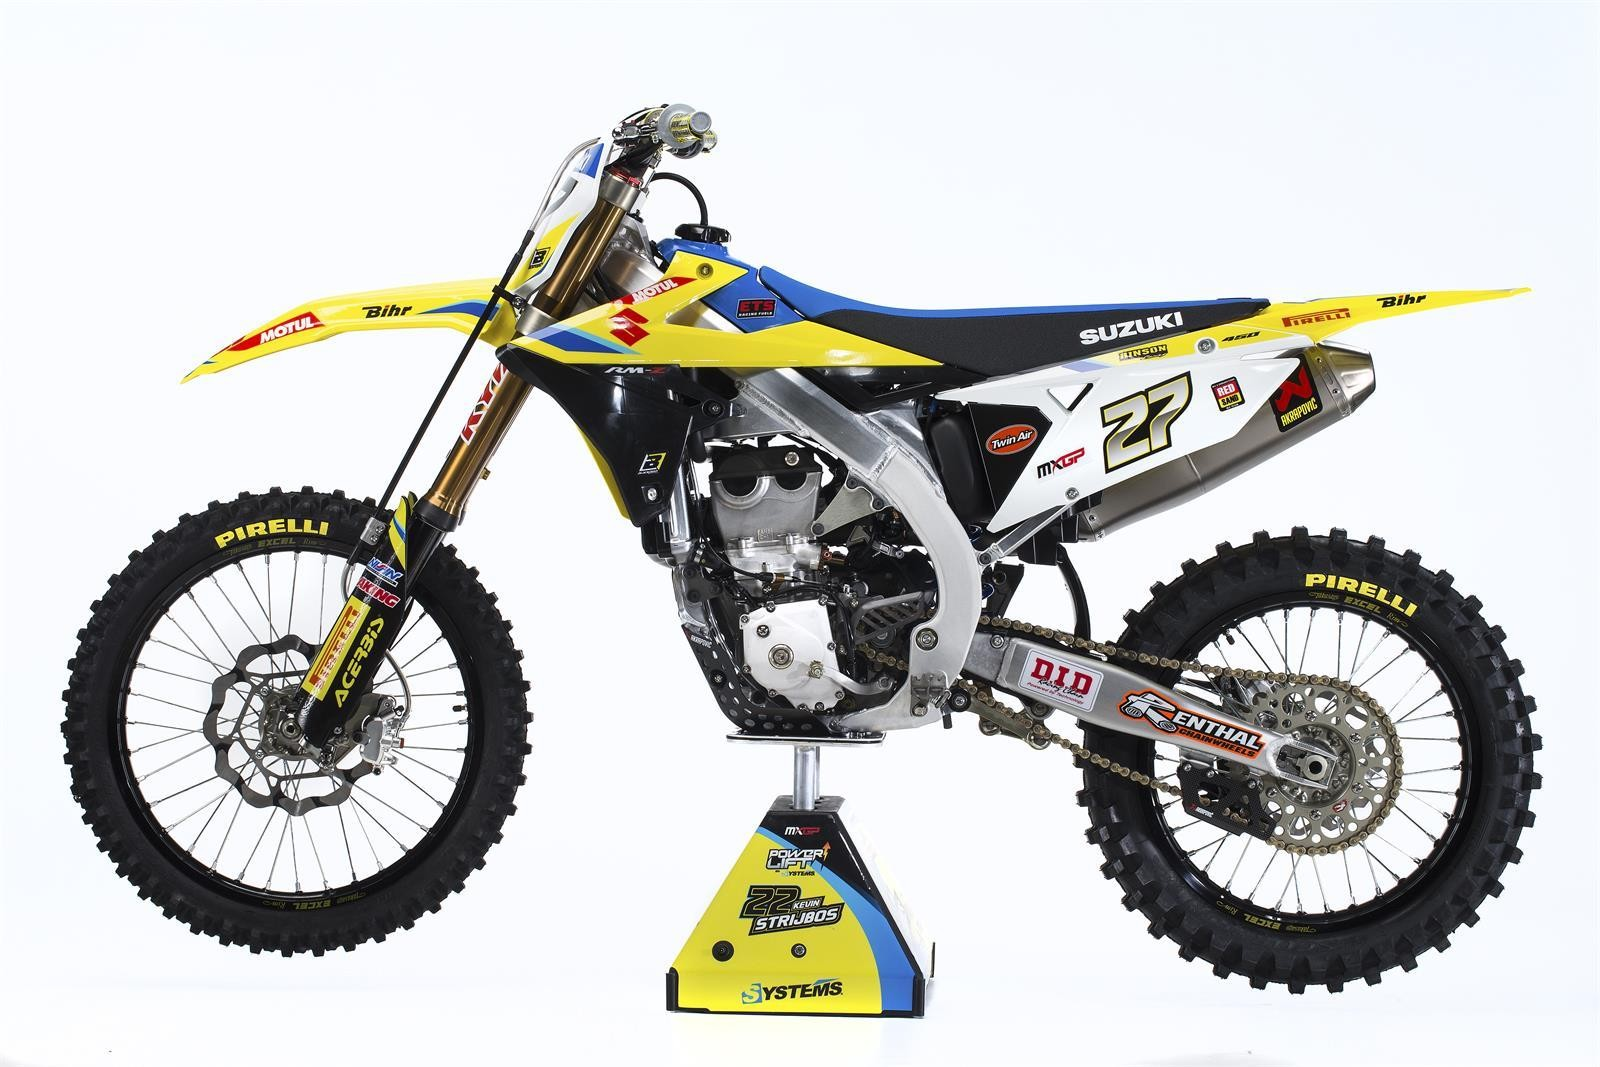 Arminas Jasikonis' 2018 Suzuki World MXGP RM-Z450WS - First Look: 2017 Suzuki World MXGP Team - Motocross Pictures - Vital MX